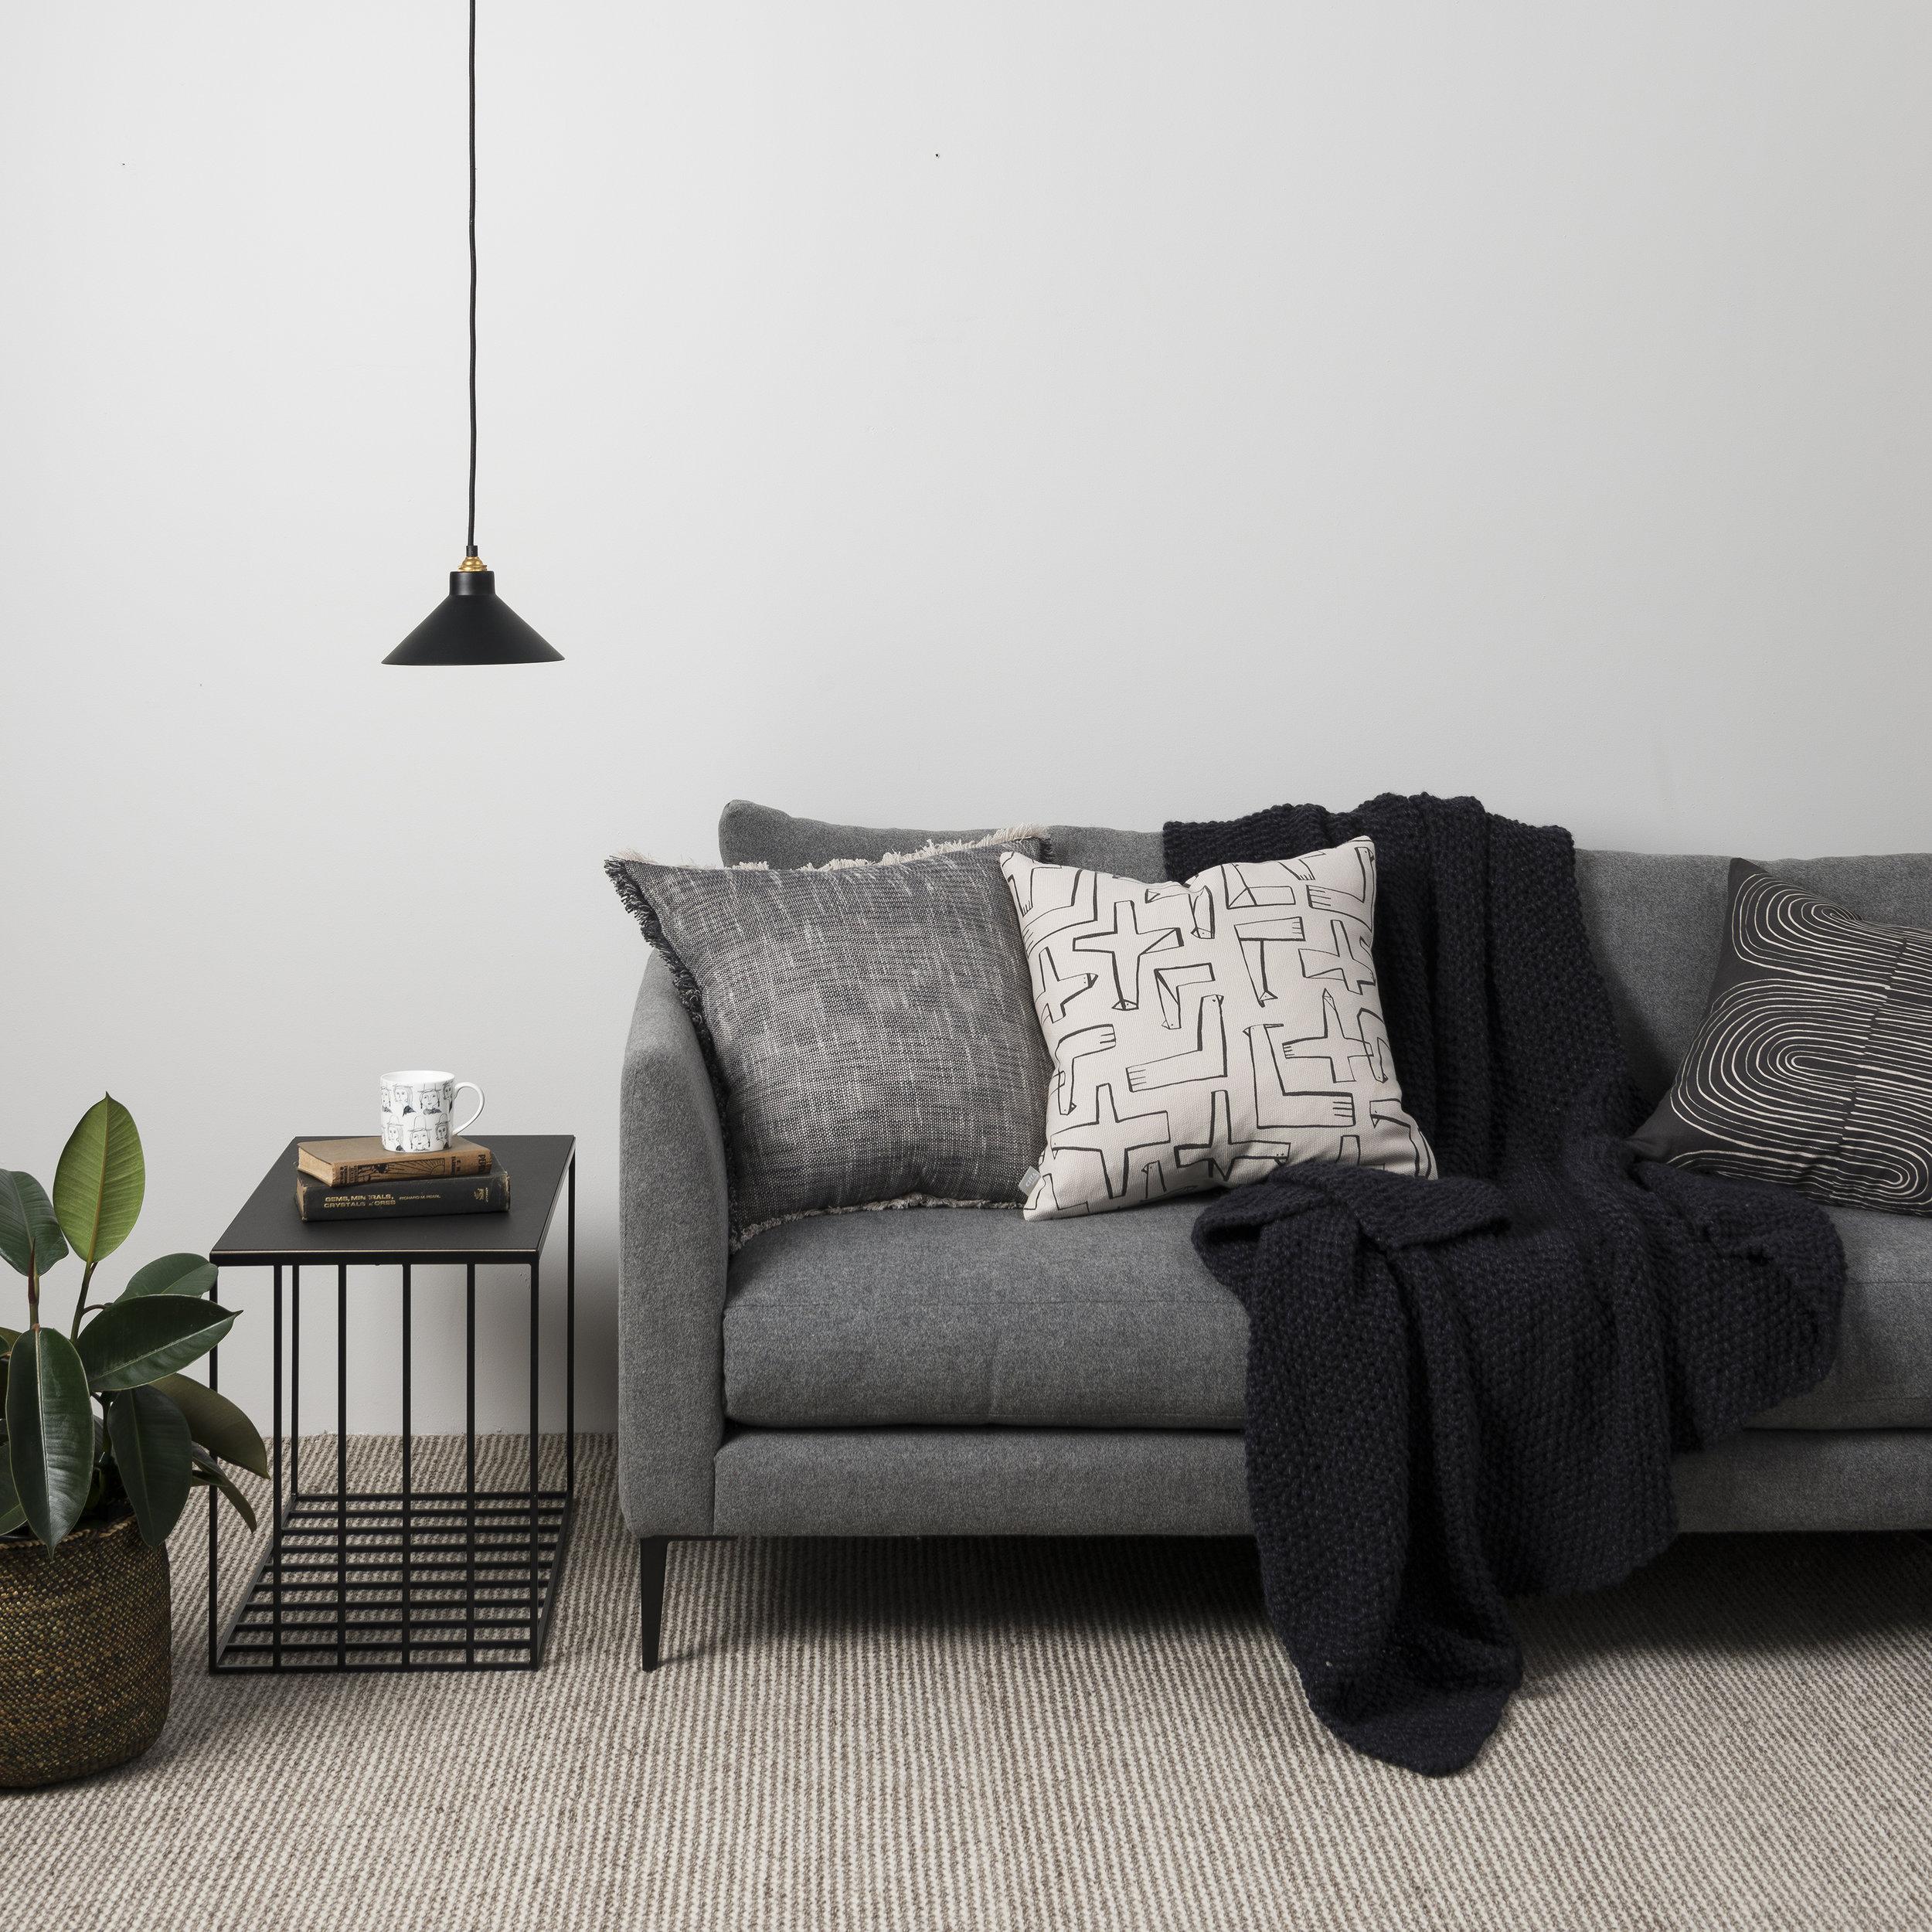 Città monochrome sofa styling inspiration